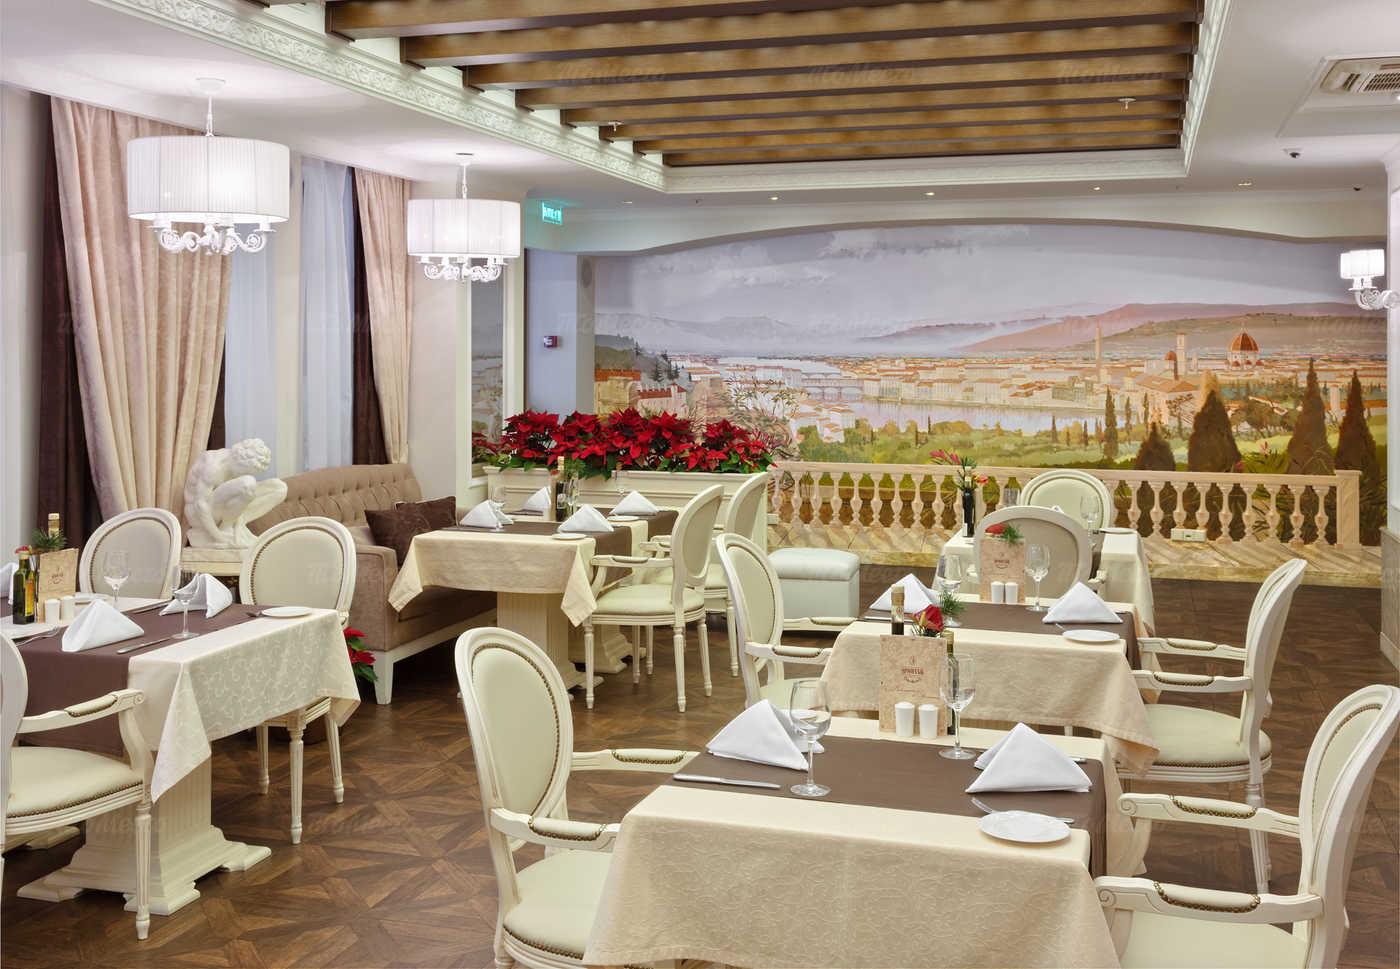 Меню ресторана Michelangelo на улице Правды